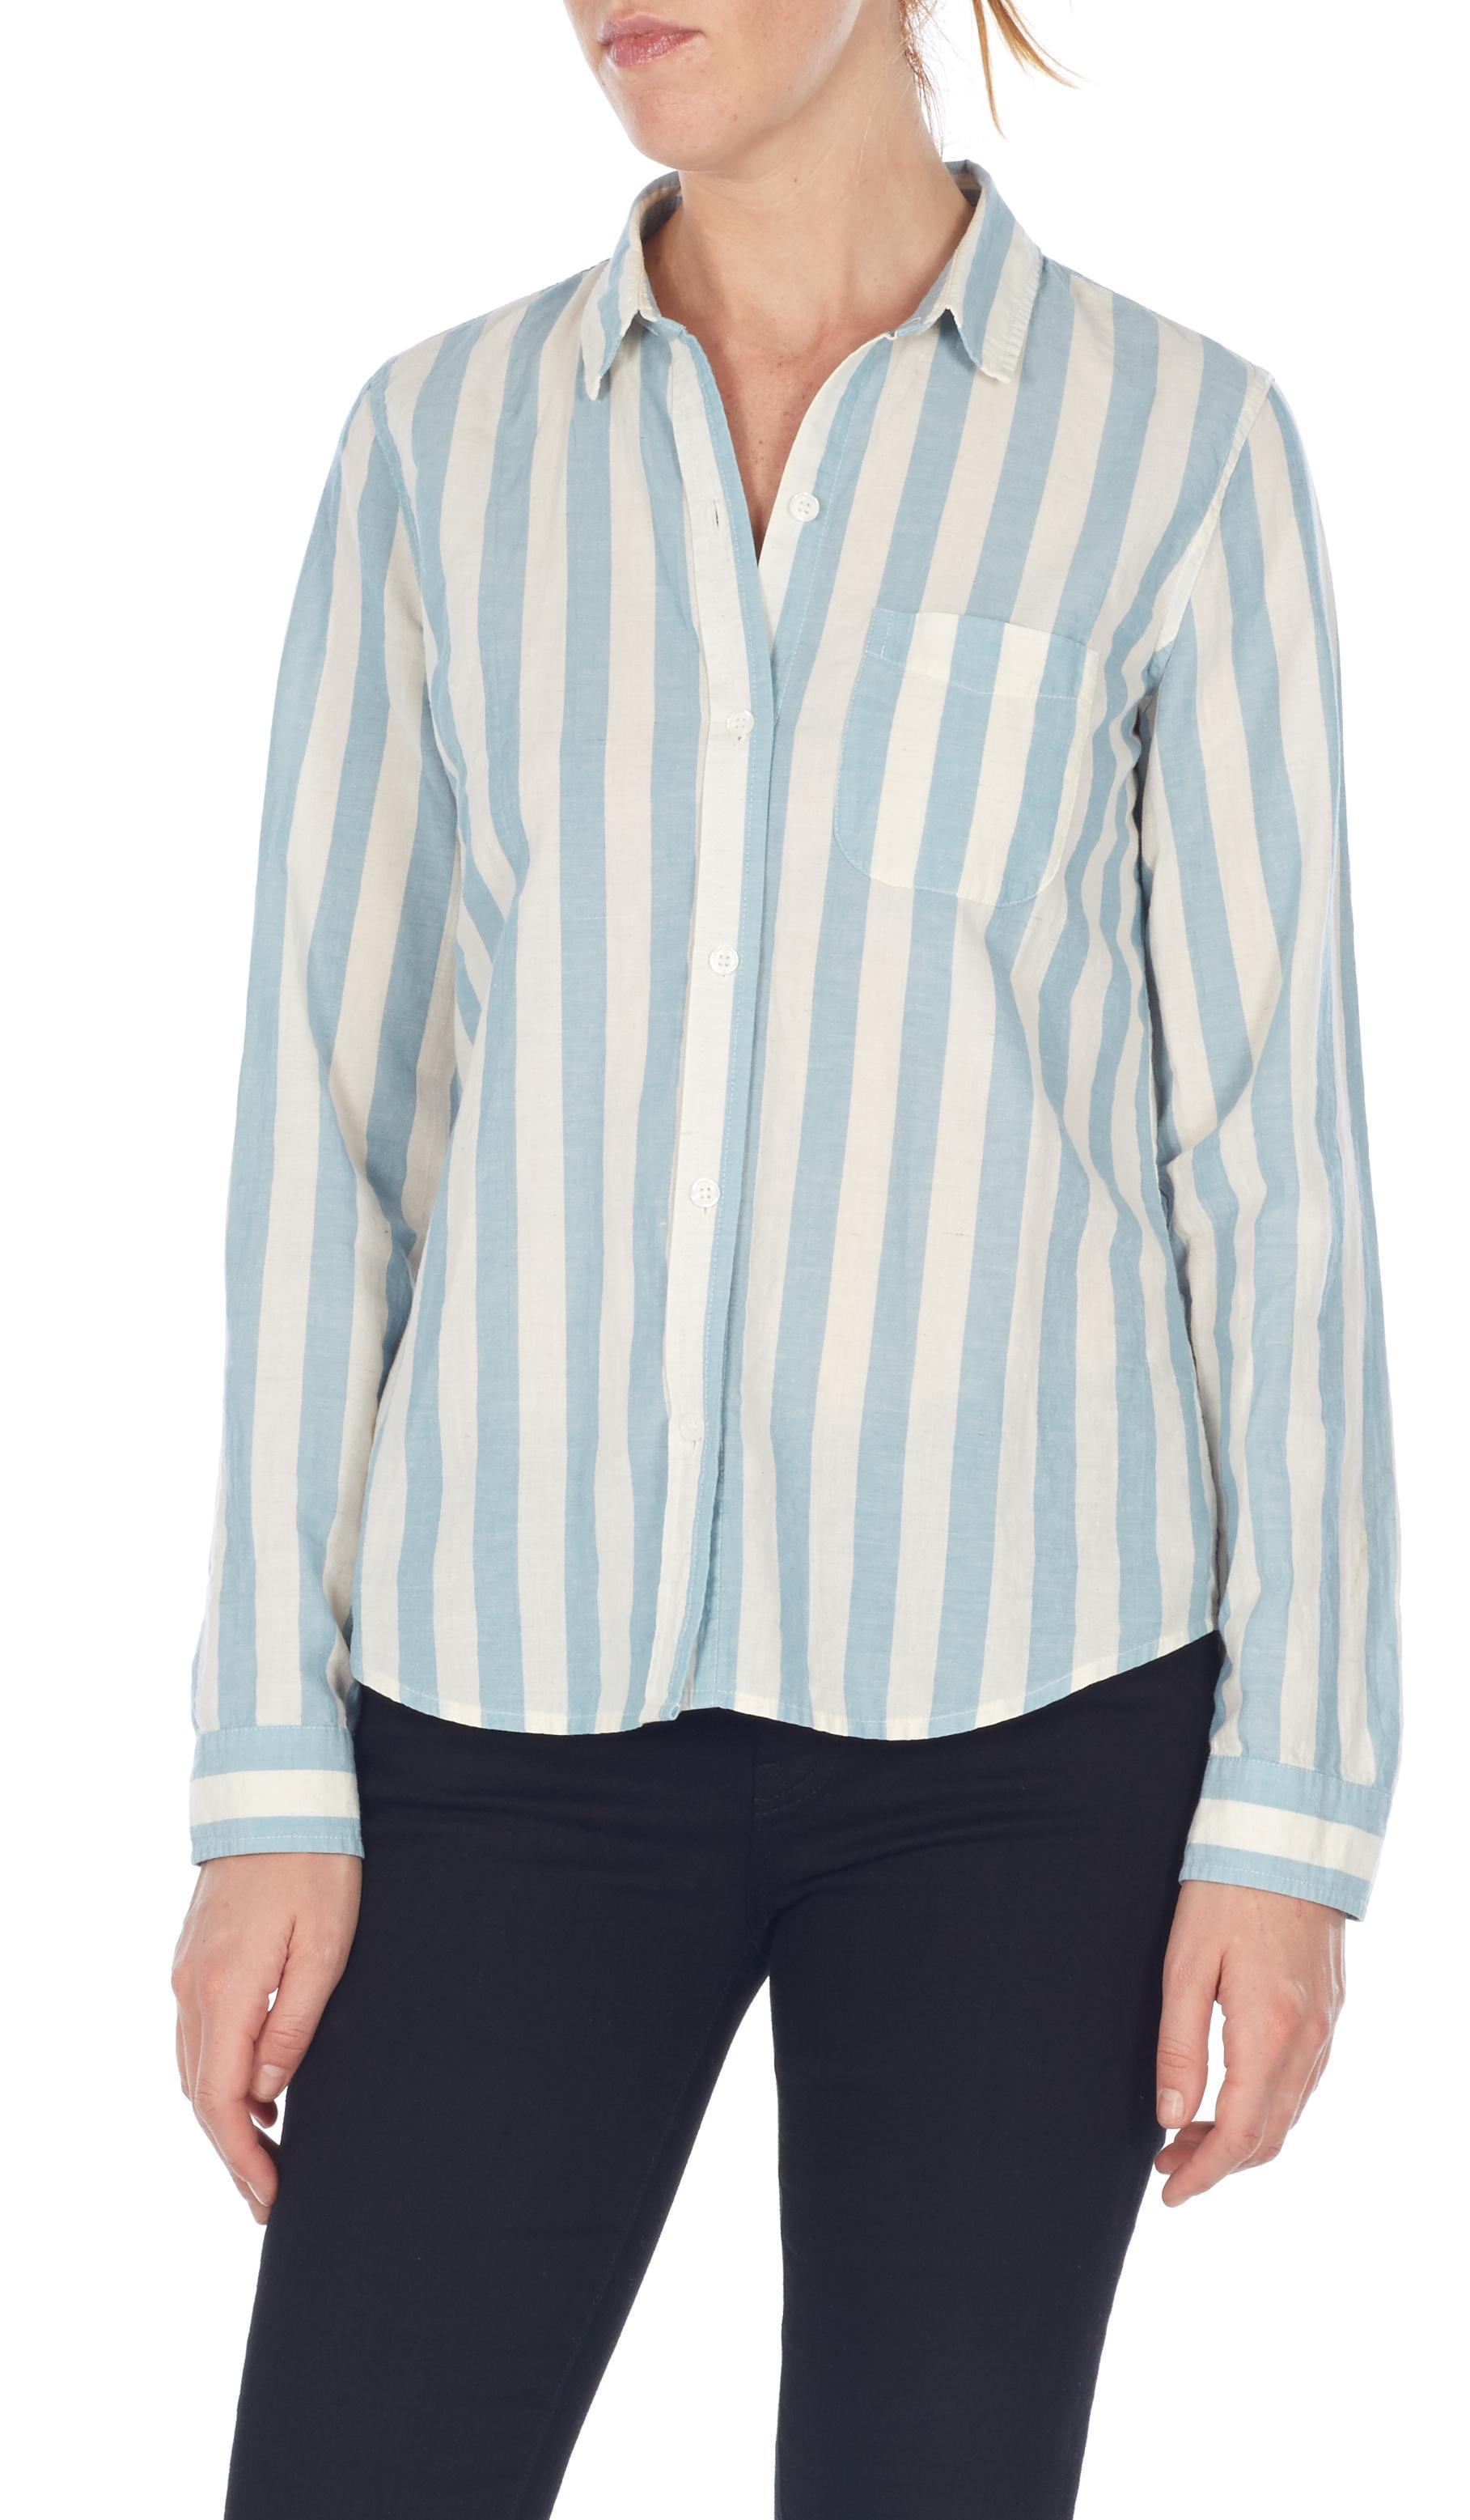 Slim boy shirt 2495-1613_AWNINGSTRIPE_FRONT_23077